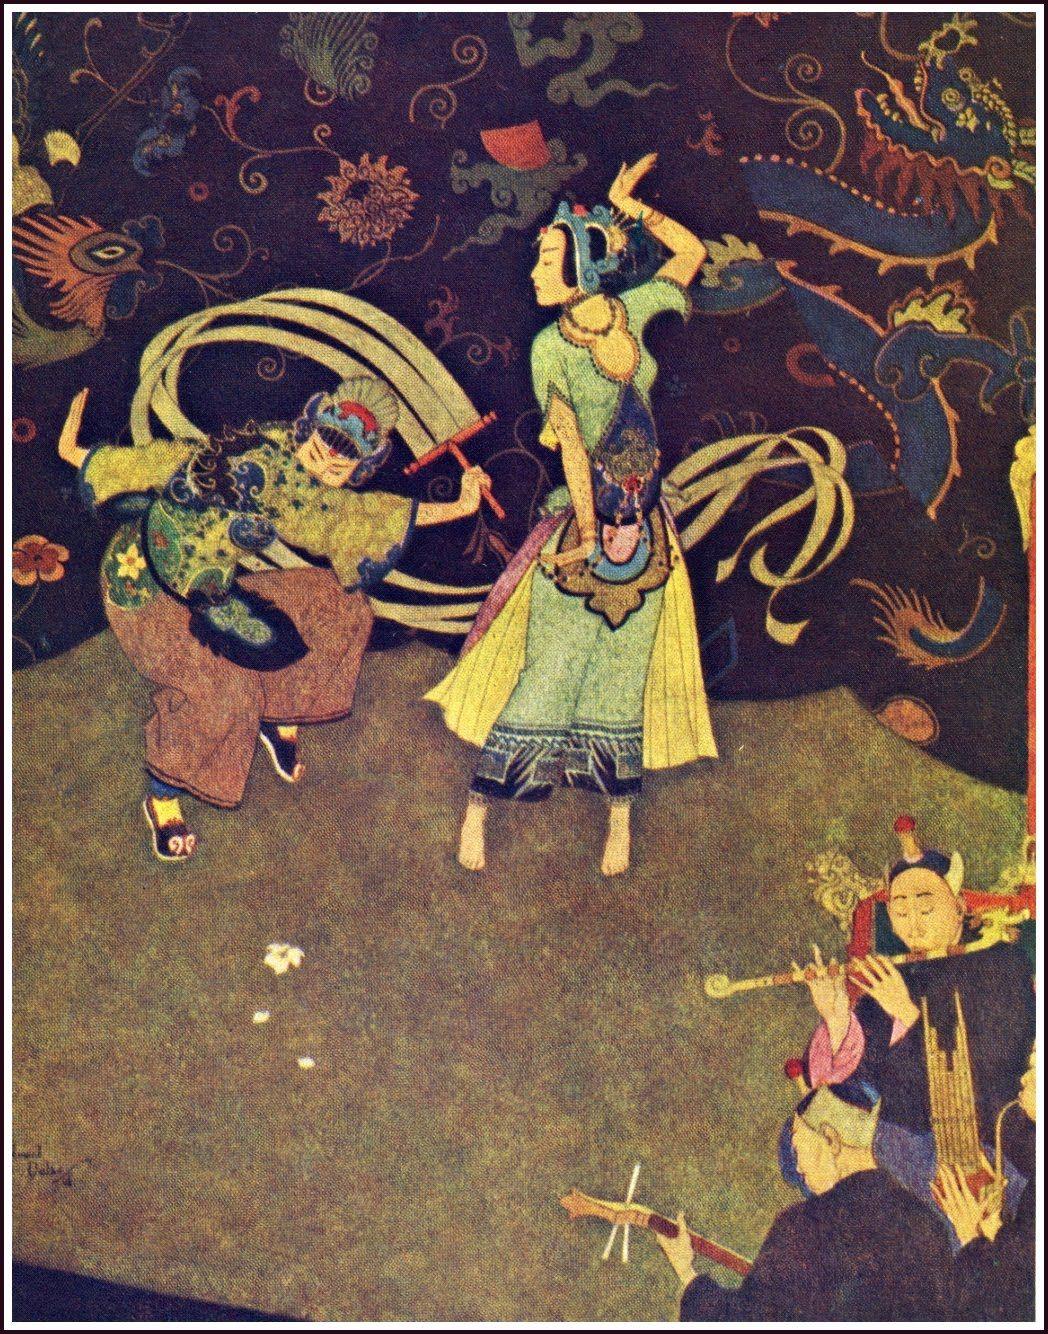 13 Arabiannights Dulac Alladin Nuptialdance Jpg Image Edmund Dulac Arabian Nights Sinbad The Sailor